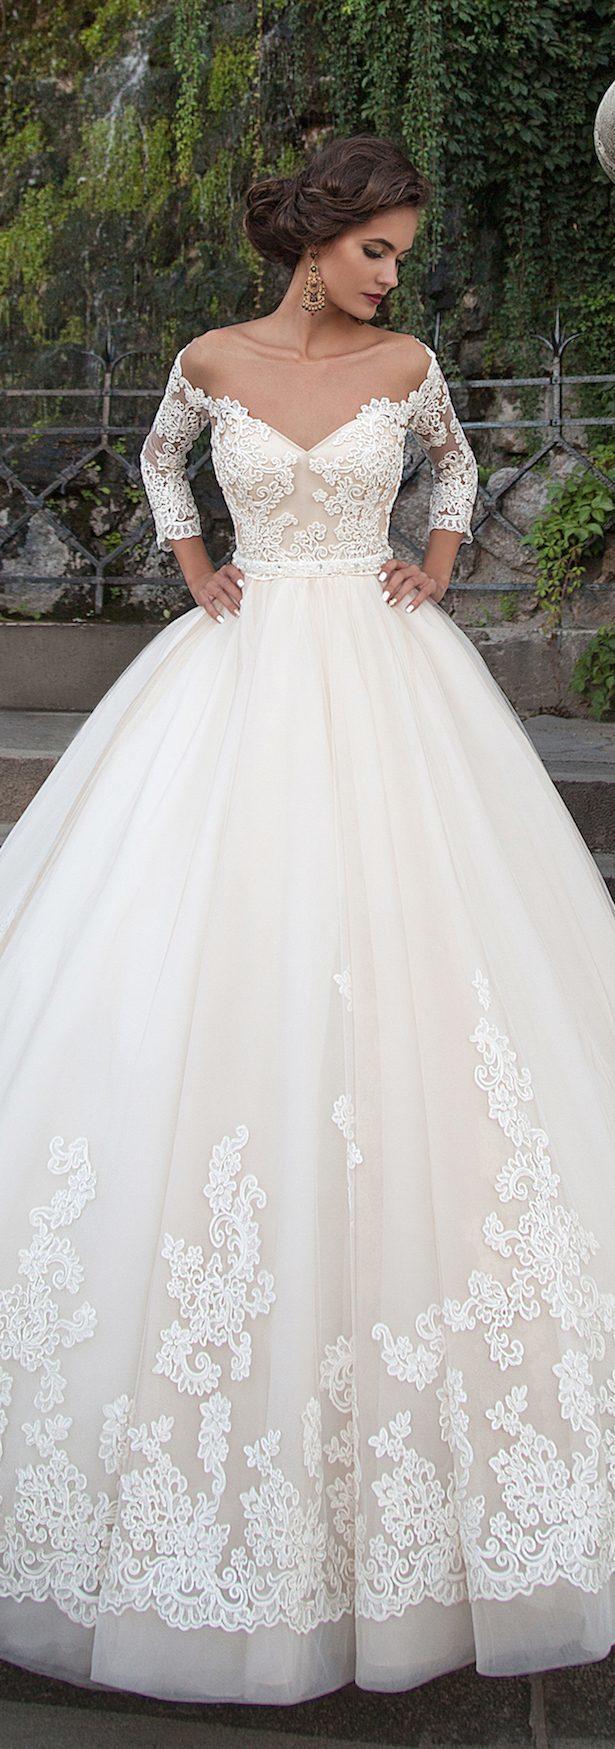 Which wedding dress should I get?